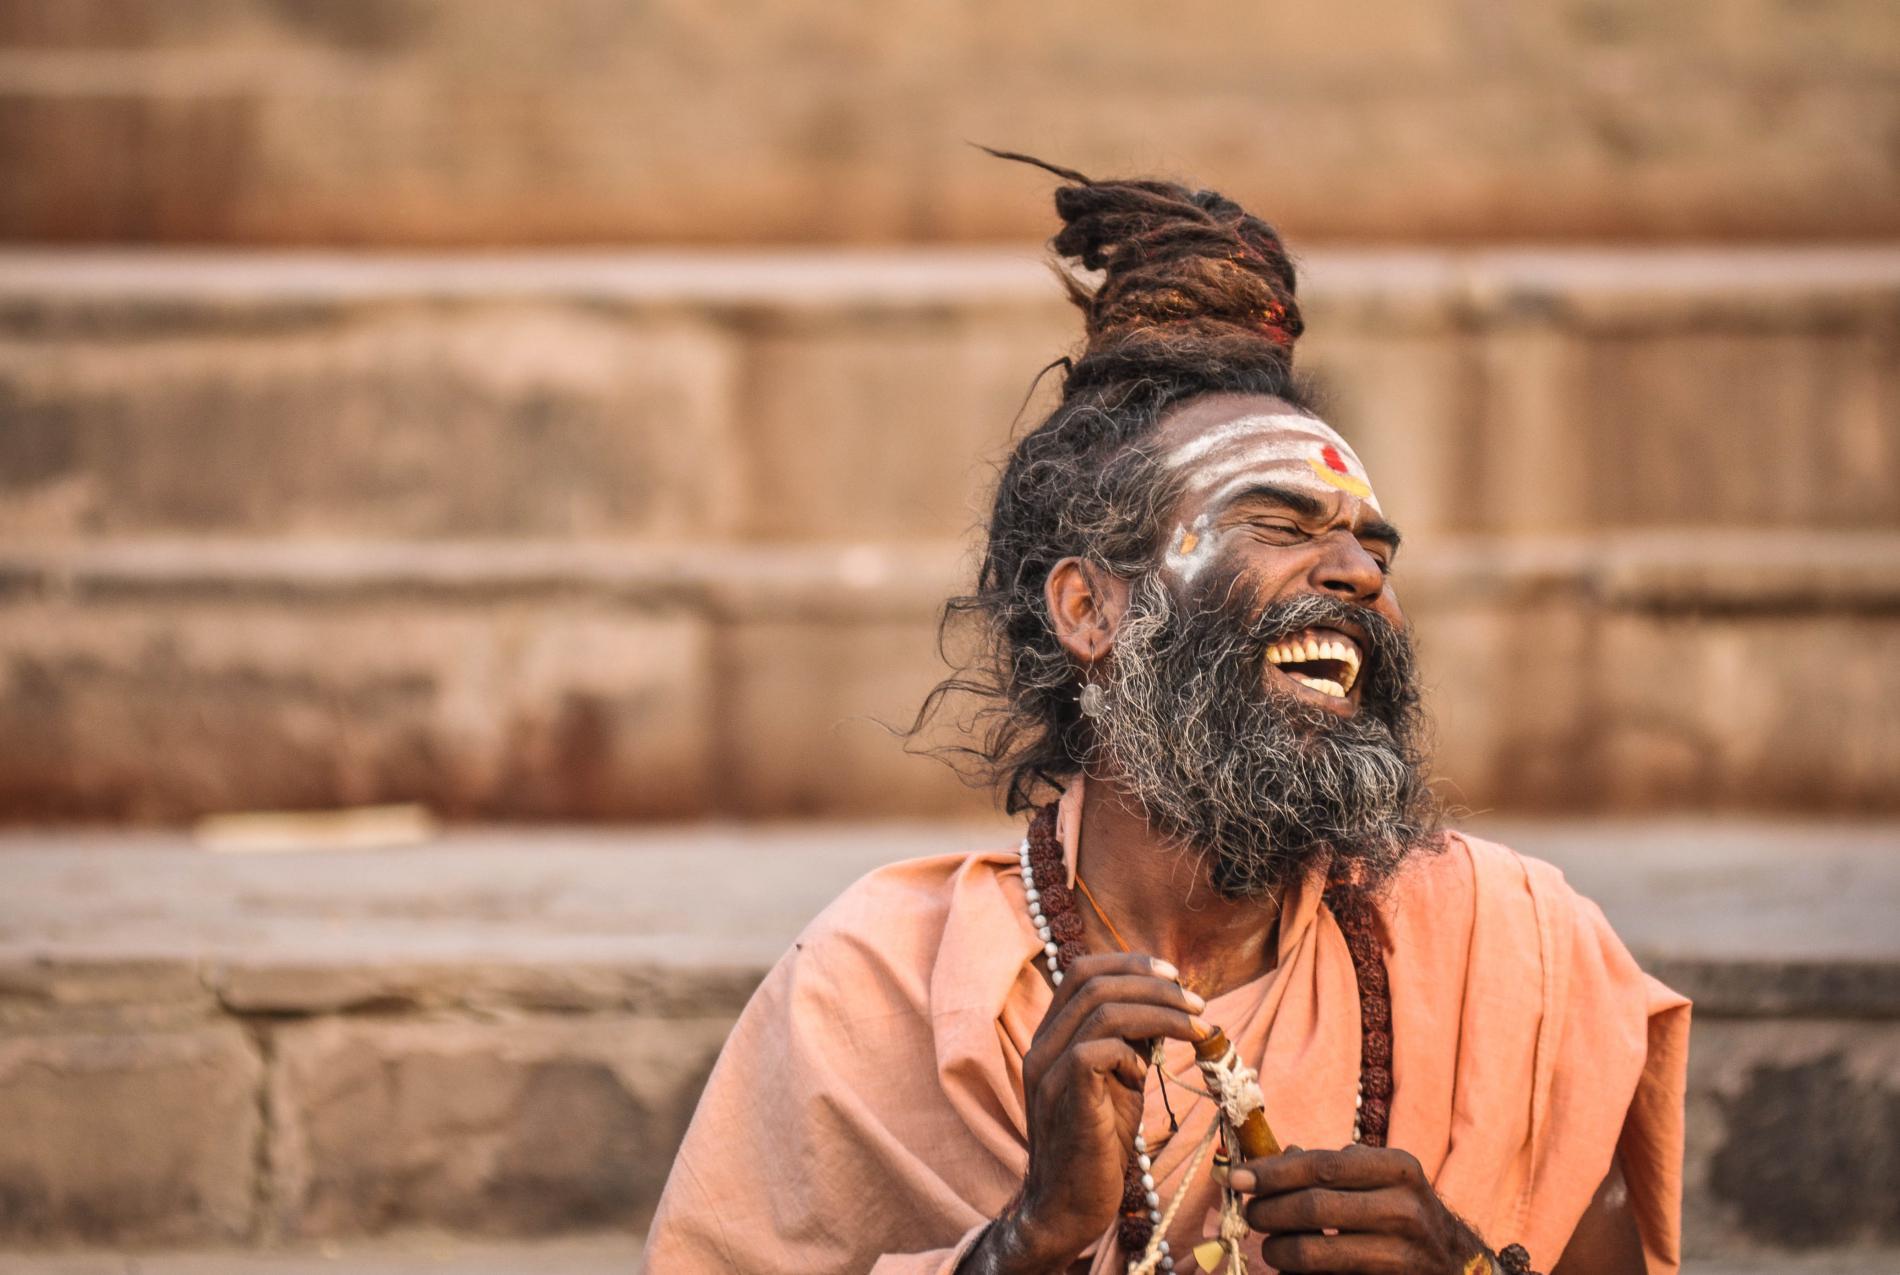 Inde : Nos voyages solidaires